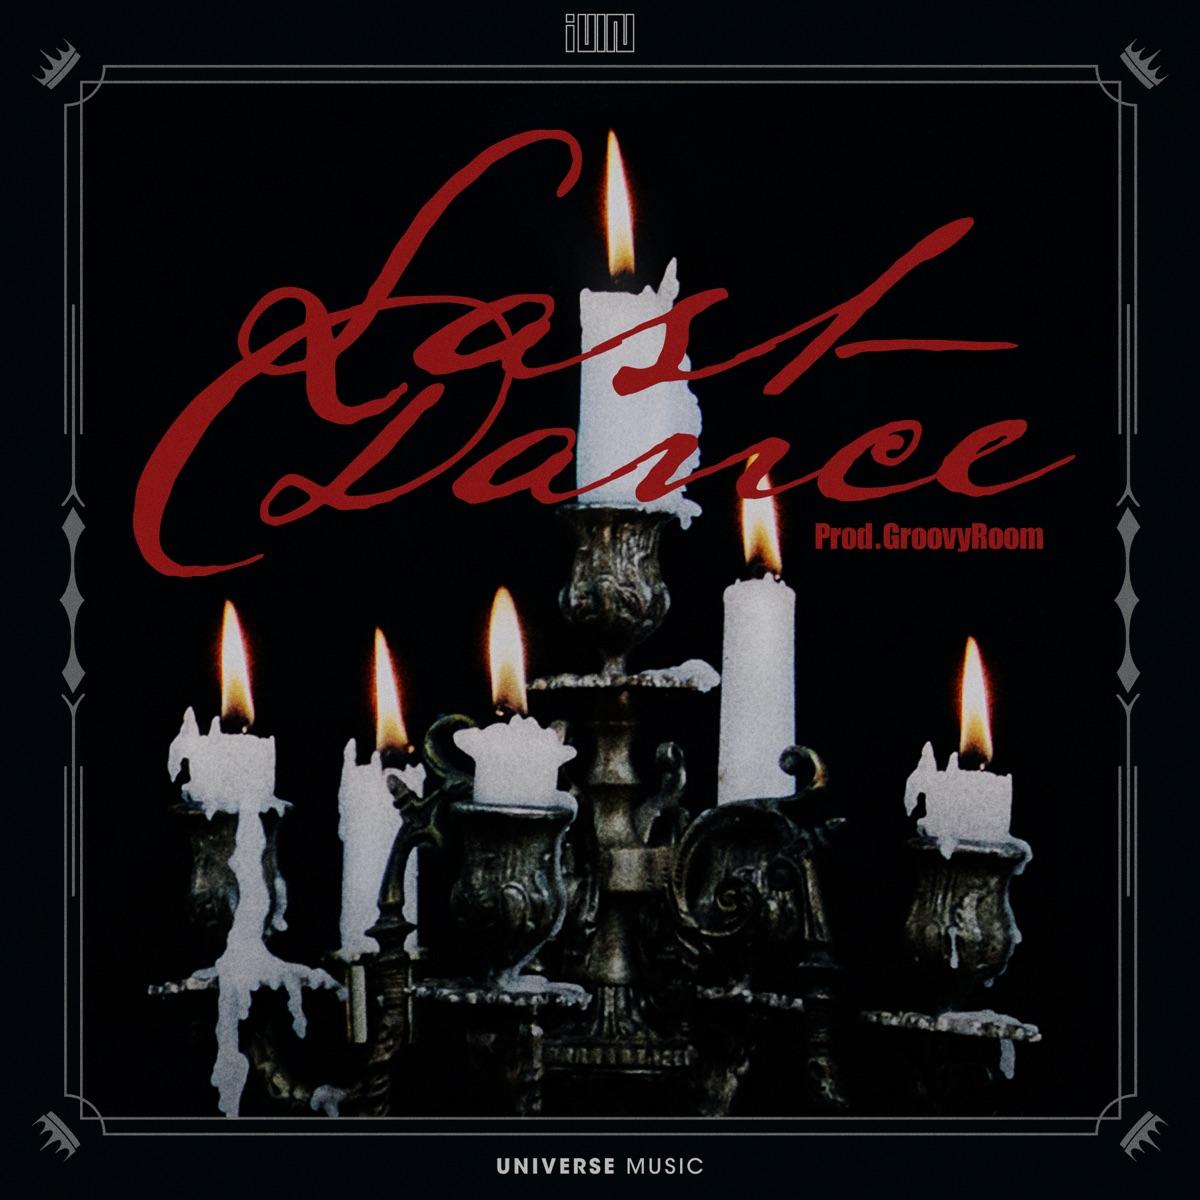 『(G)I-DLE - Last Dance』収録の『Last Dance』ジャケット